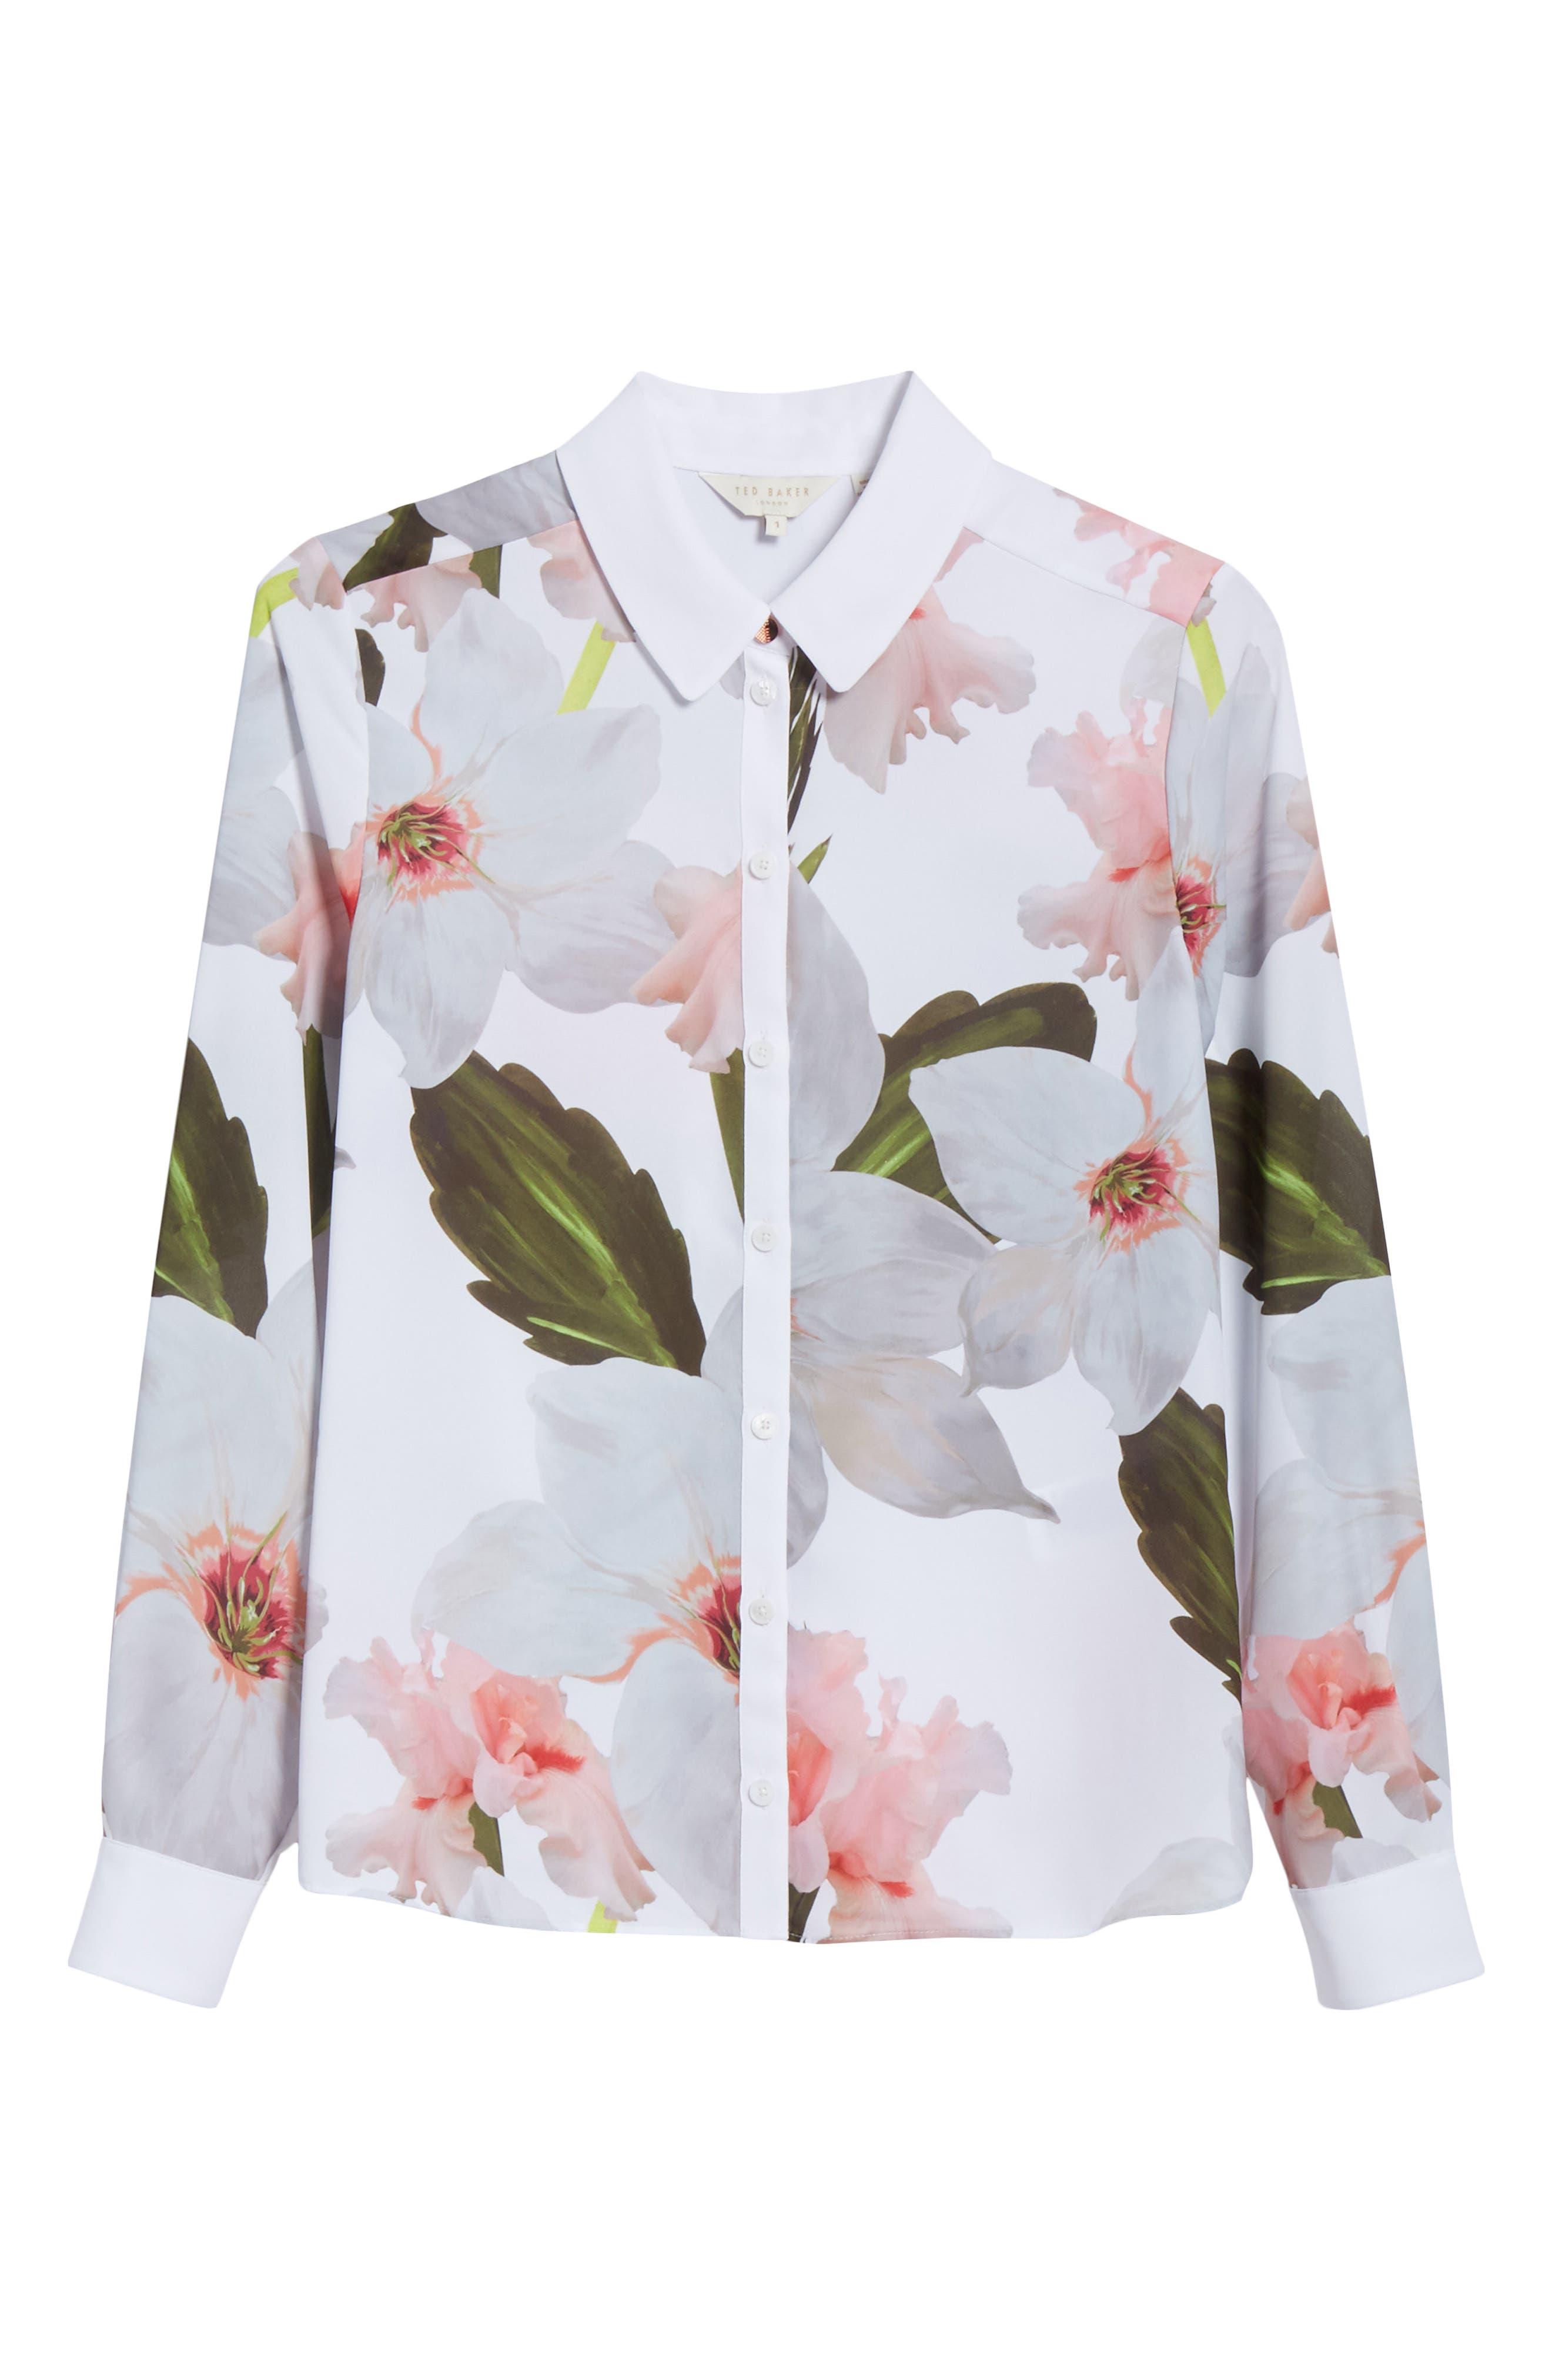 Chatsworth Bloom Shirt,                             Alternate thumbnail 6, color,                             White